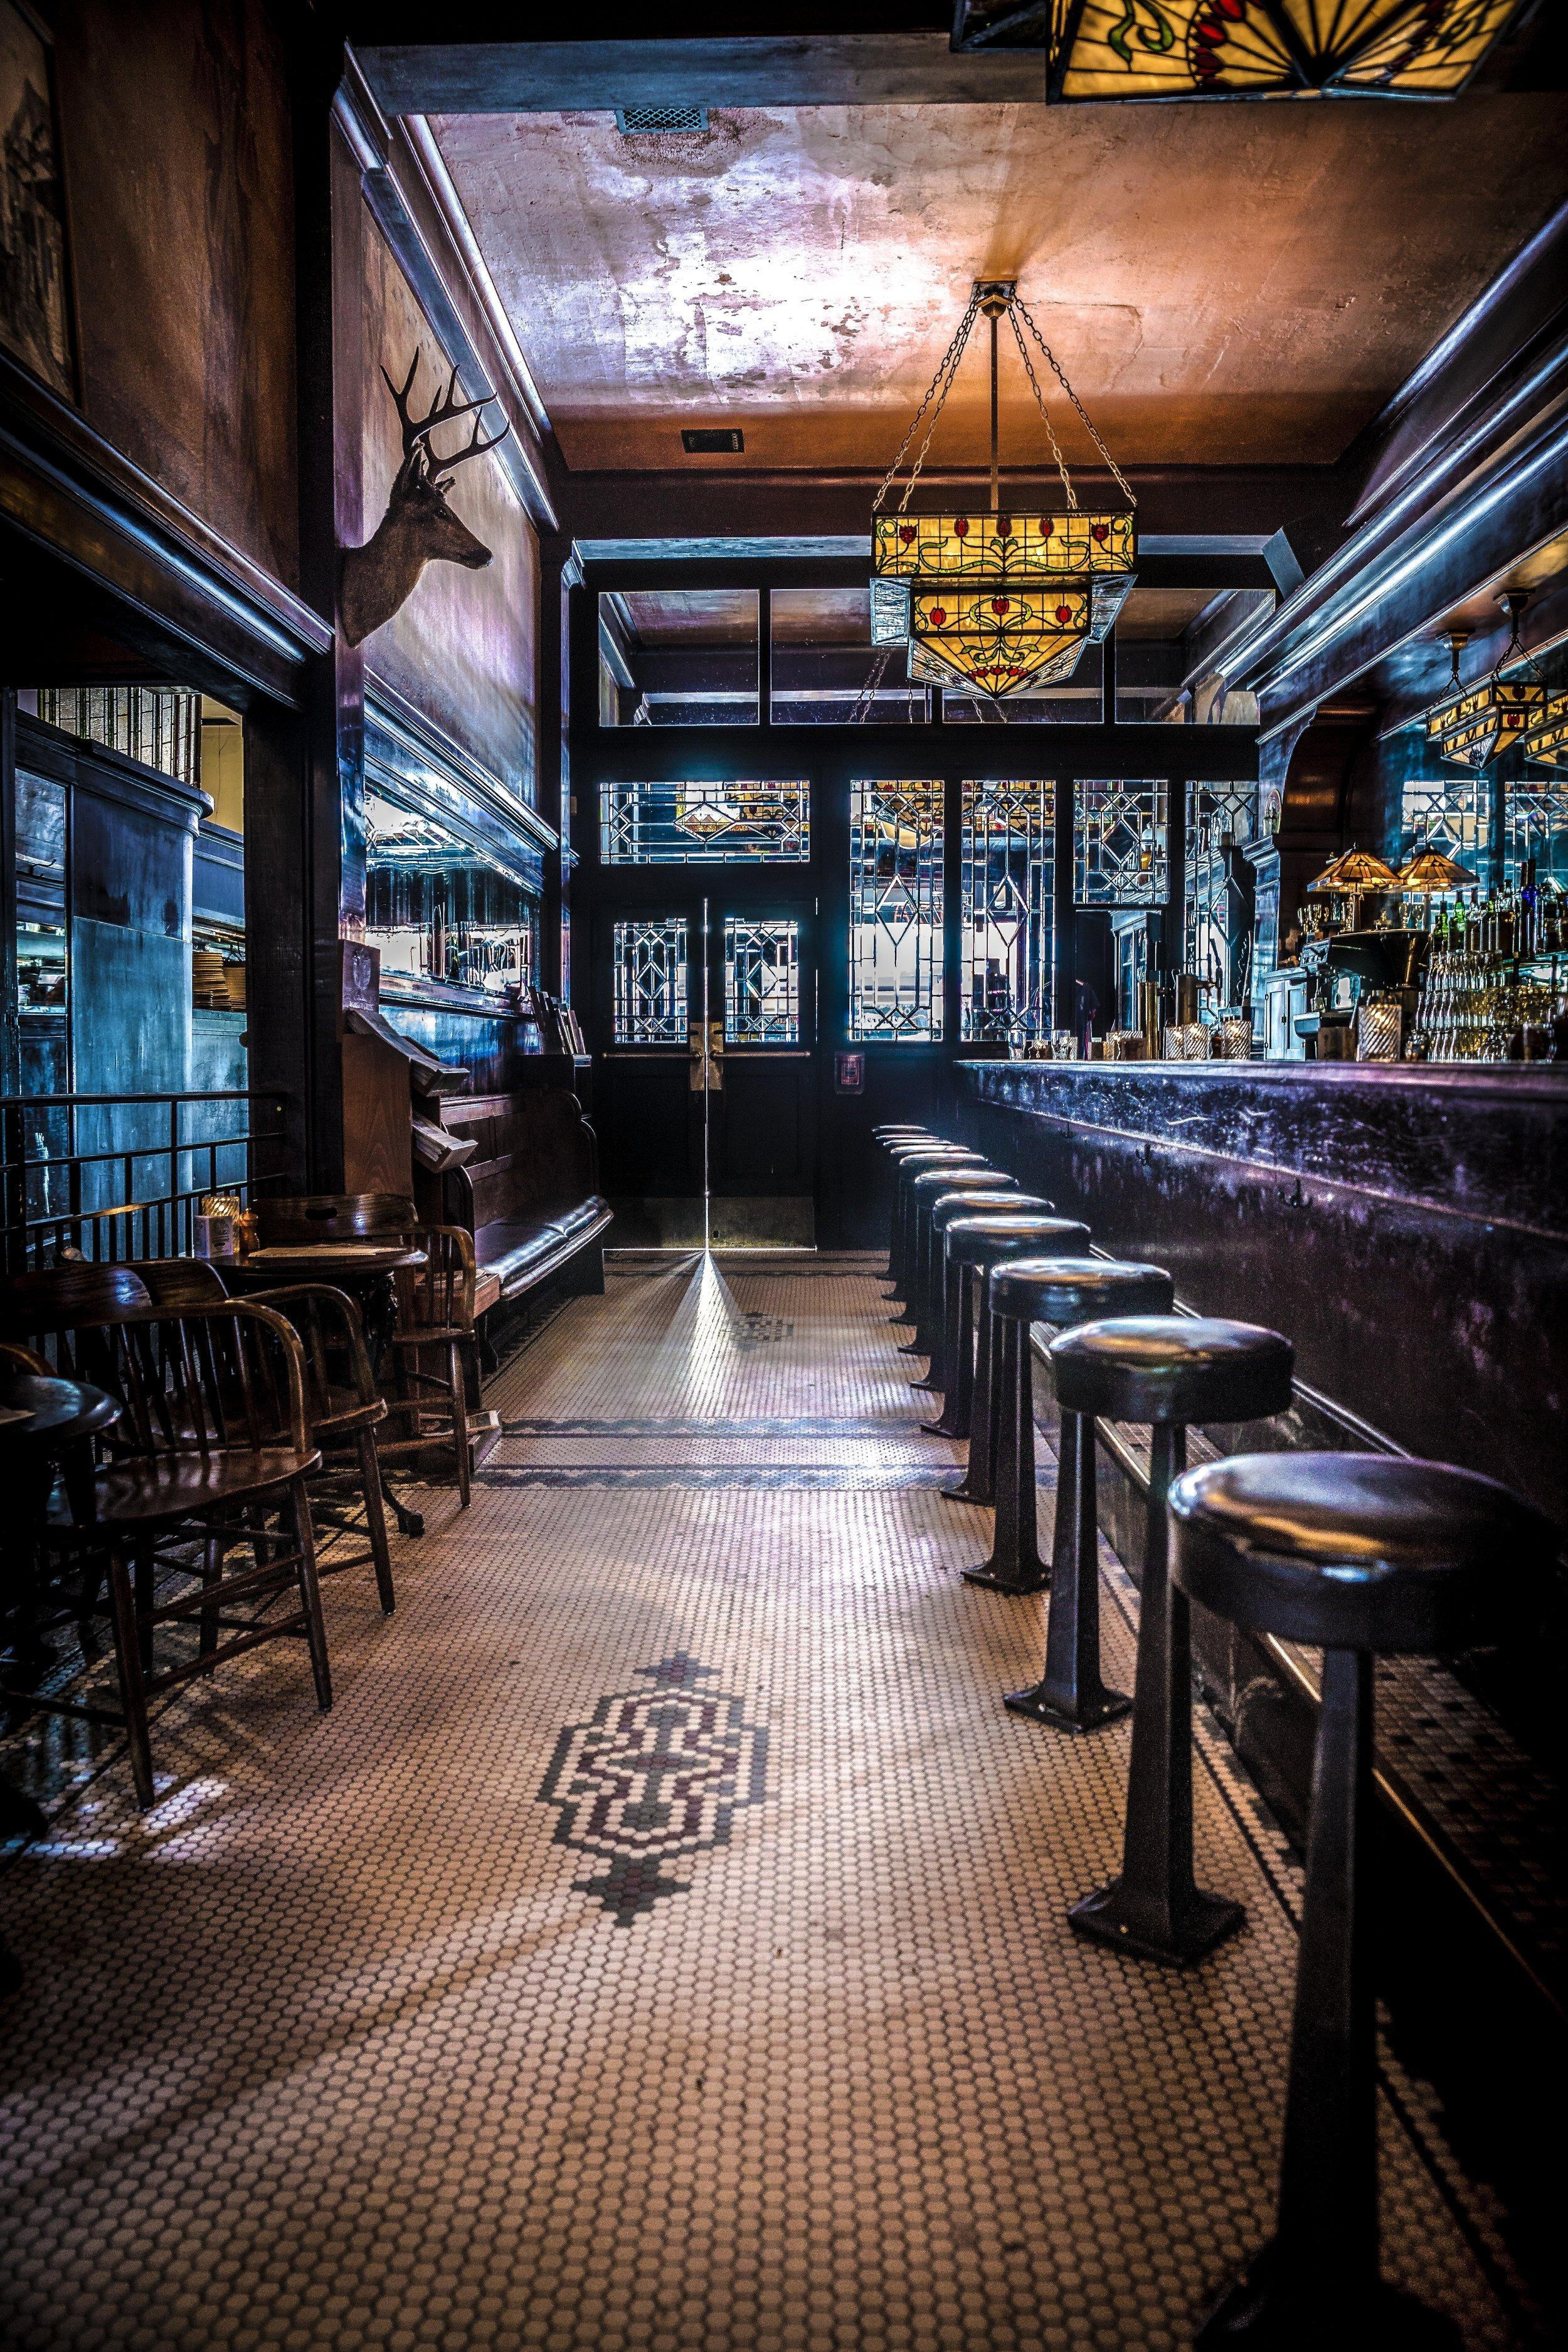 Tom_Lupton_Photography_Restaurant.jpg